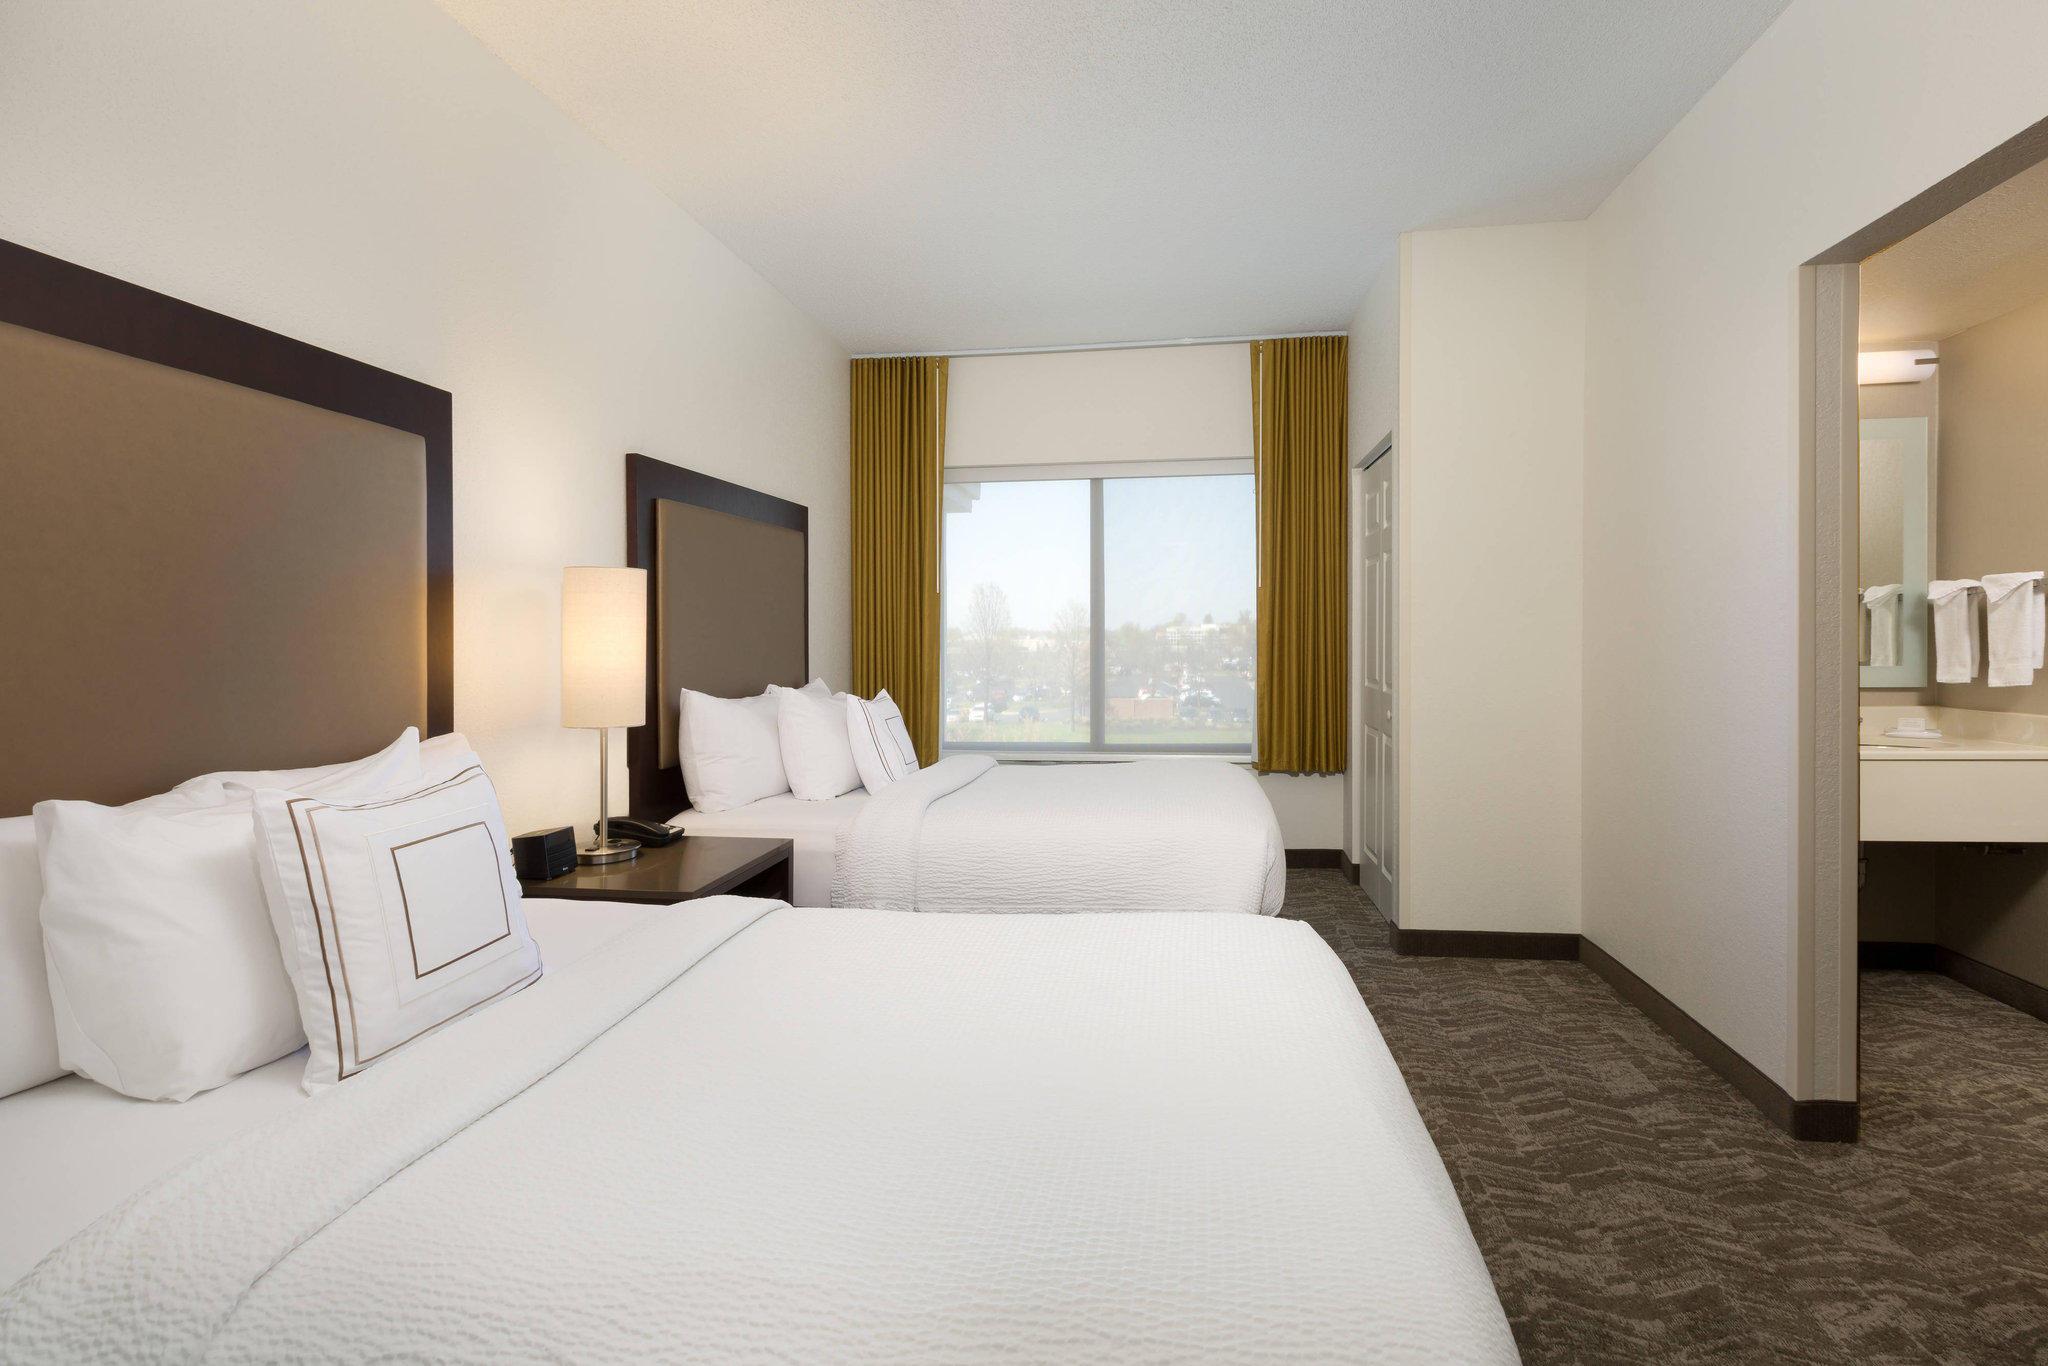 SpringHill Suites by Marriott Louisville Hurstbourne/North